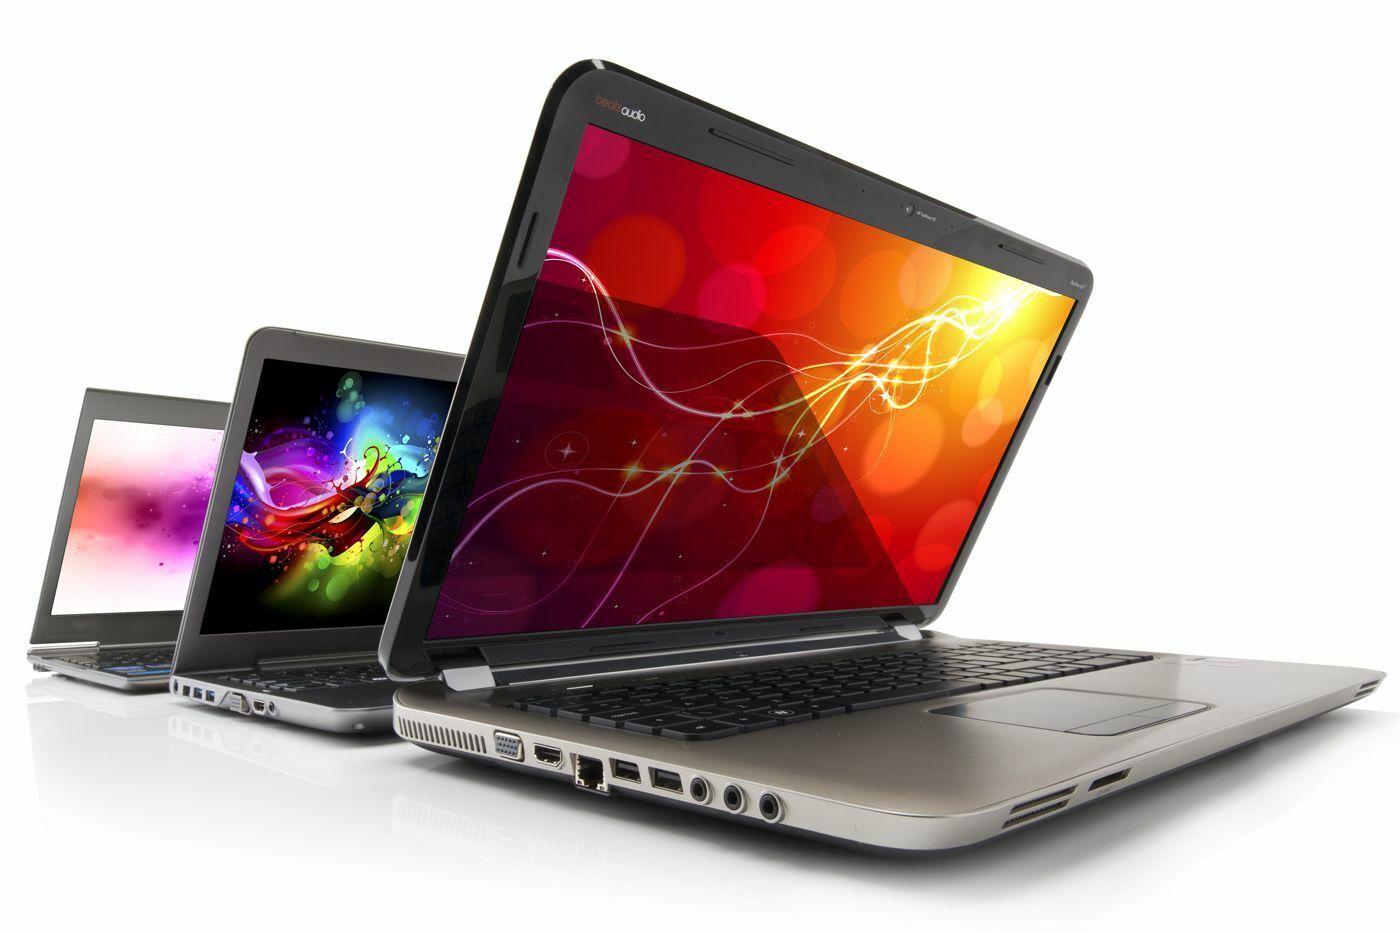 Laptop Windows - CHEAP FAST LAPTOP INTEL i3 WINDOWS 10 500GB 128GB SSD 4GB 8GB RAM  WARRANTY